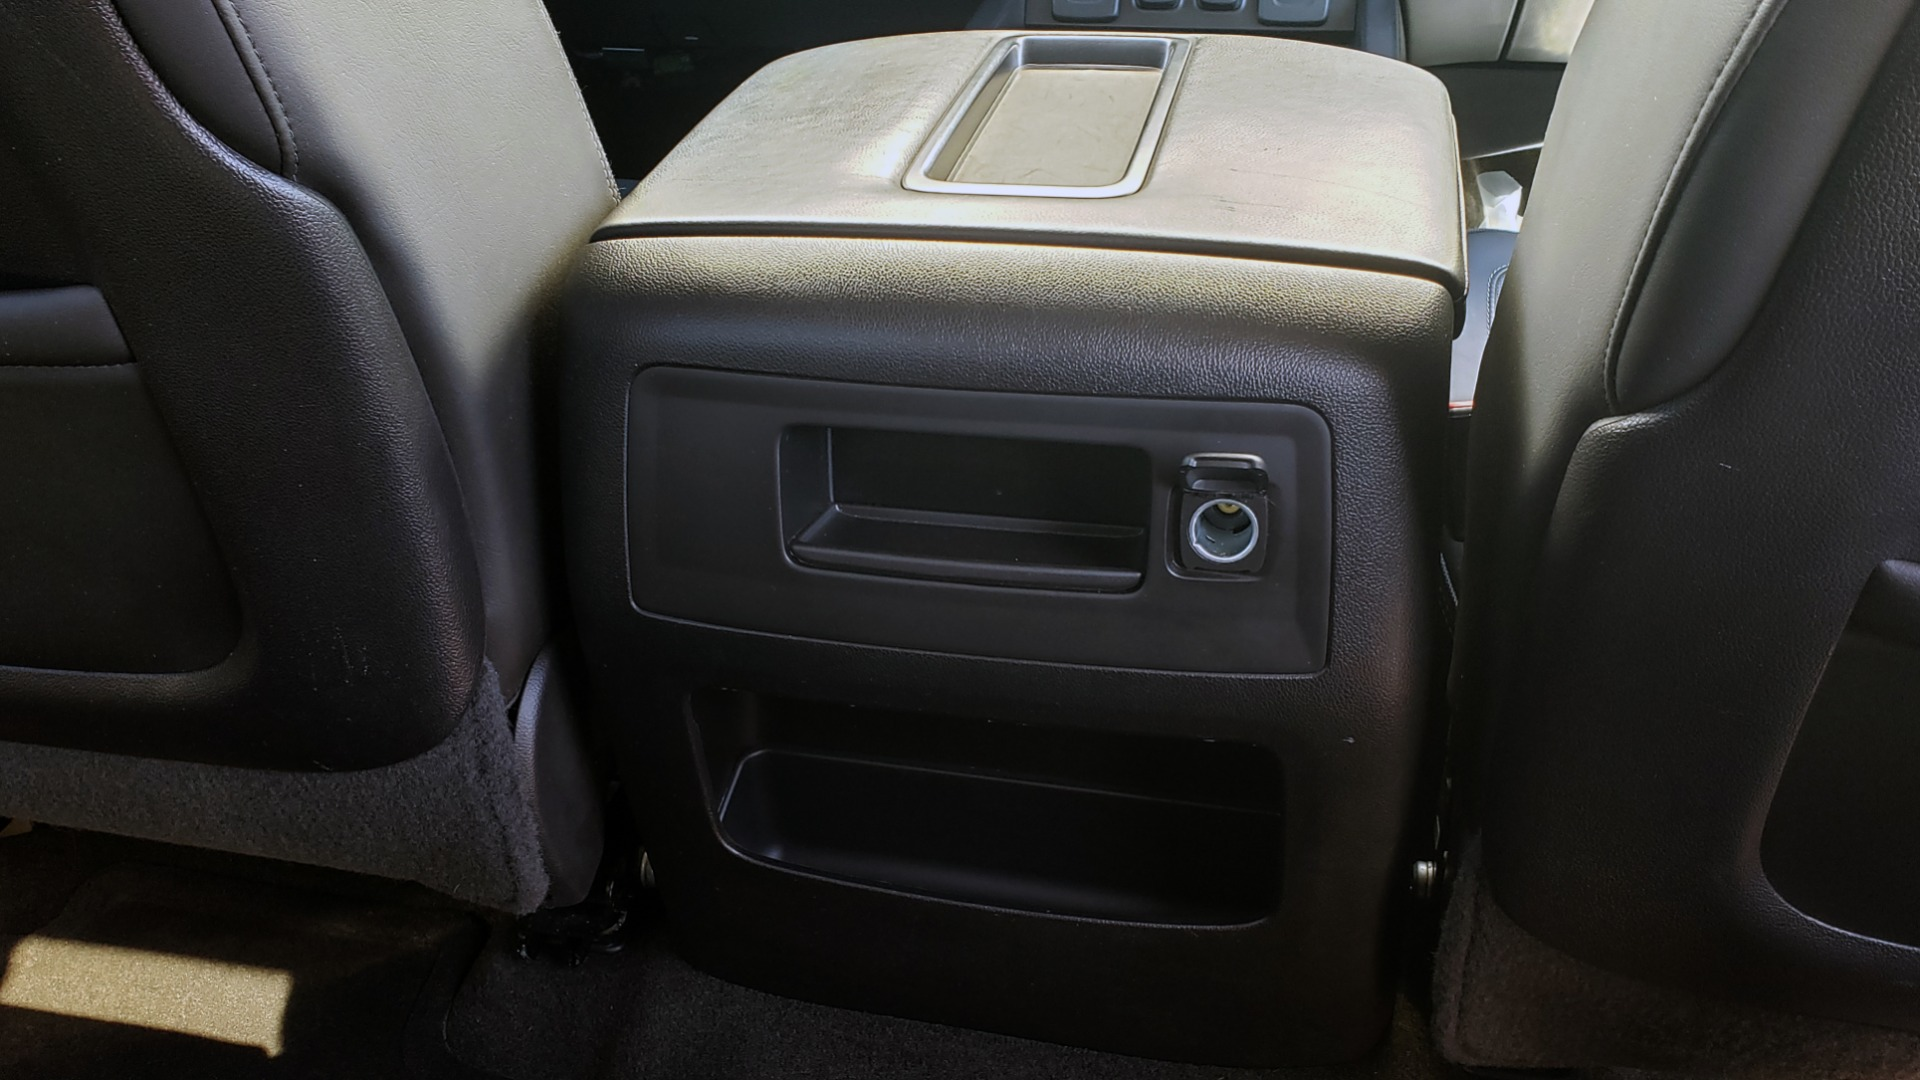 Used 2015 GMC SIERRA 2500HD DENALI 4WD CREWCAB / 6.6L DURAMAX / 6-SPD AUTO / NAV / BOSE for sale $50,995 at Formula Imports in Charlotte NC 28227 85